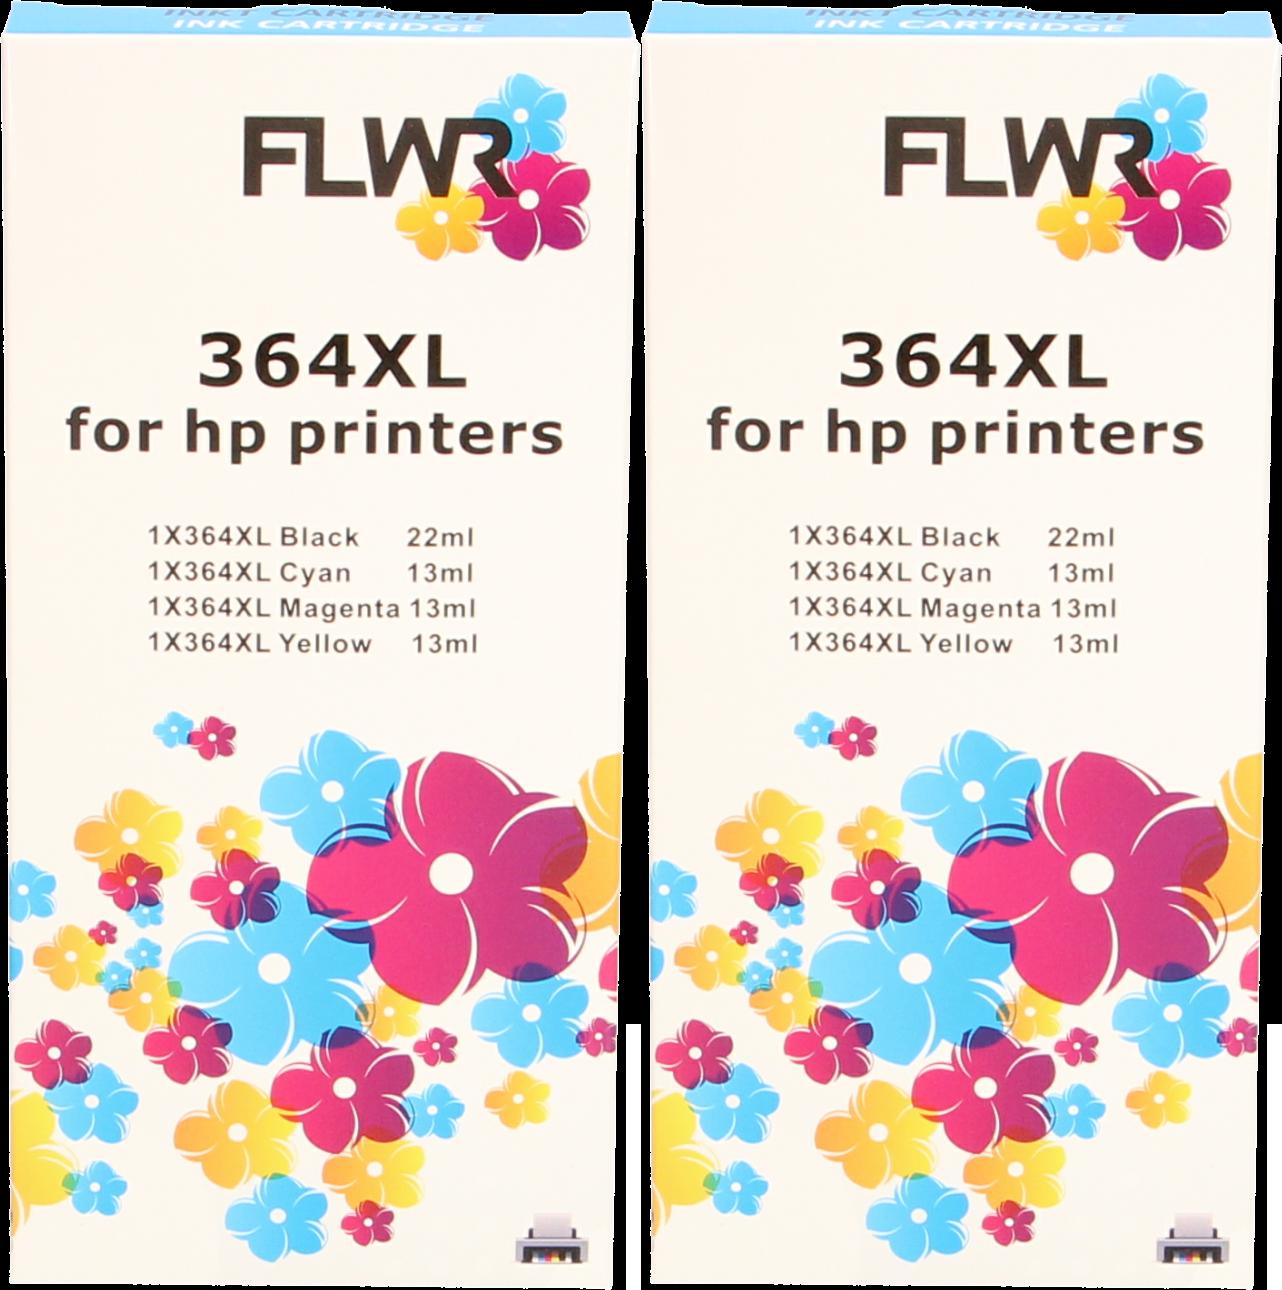 FLWR HP 364XL Multipack (2 sets) zwart en kleur